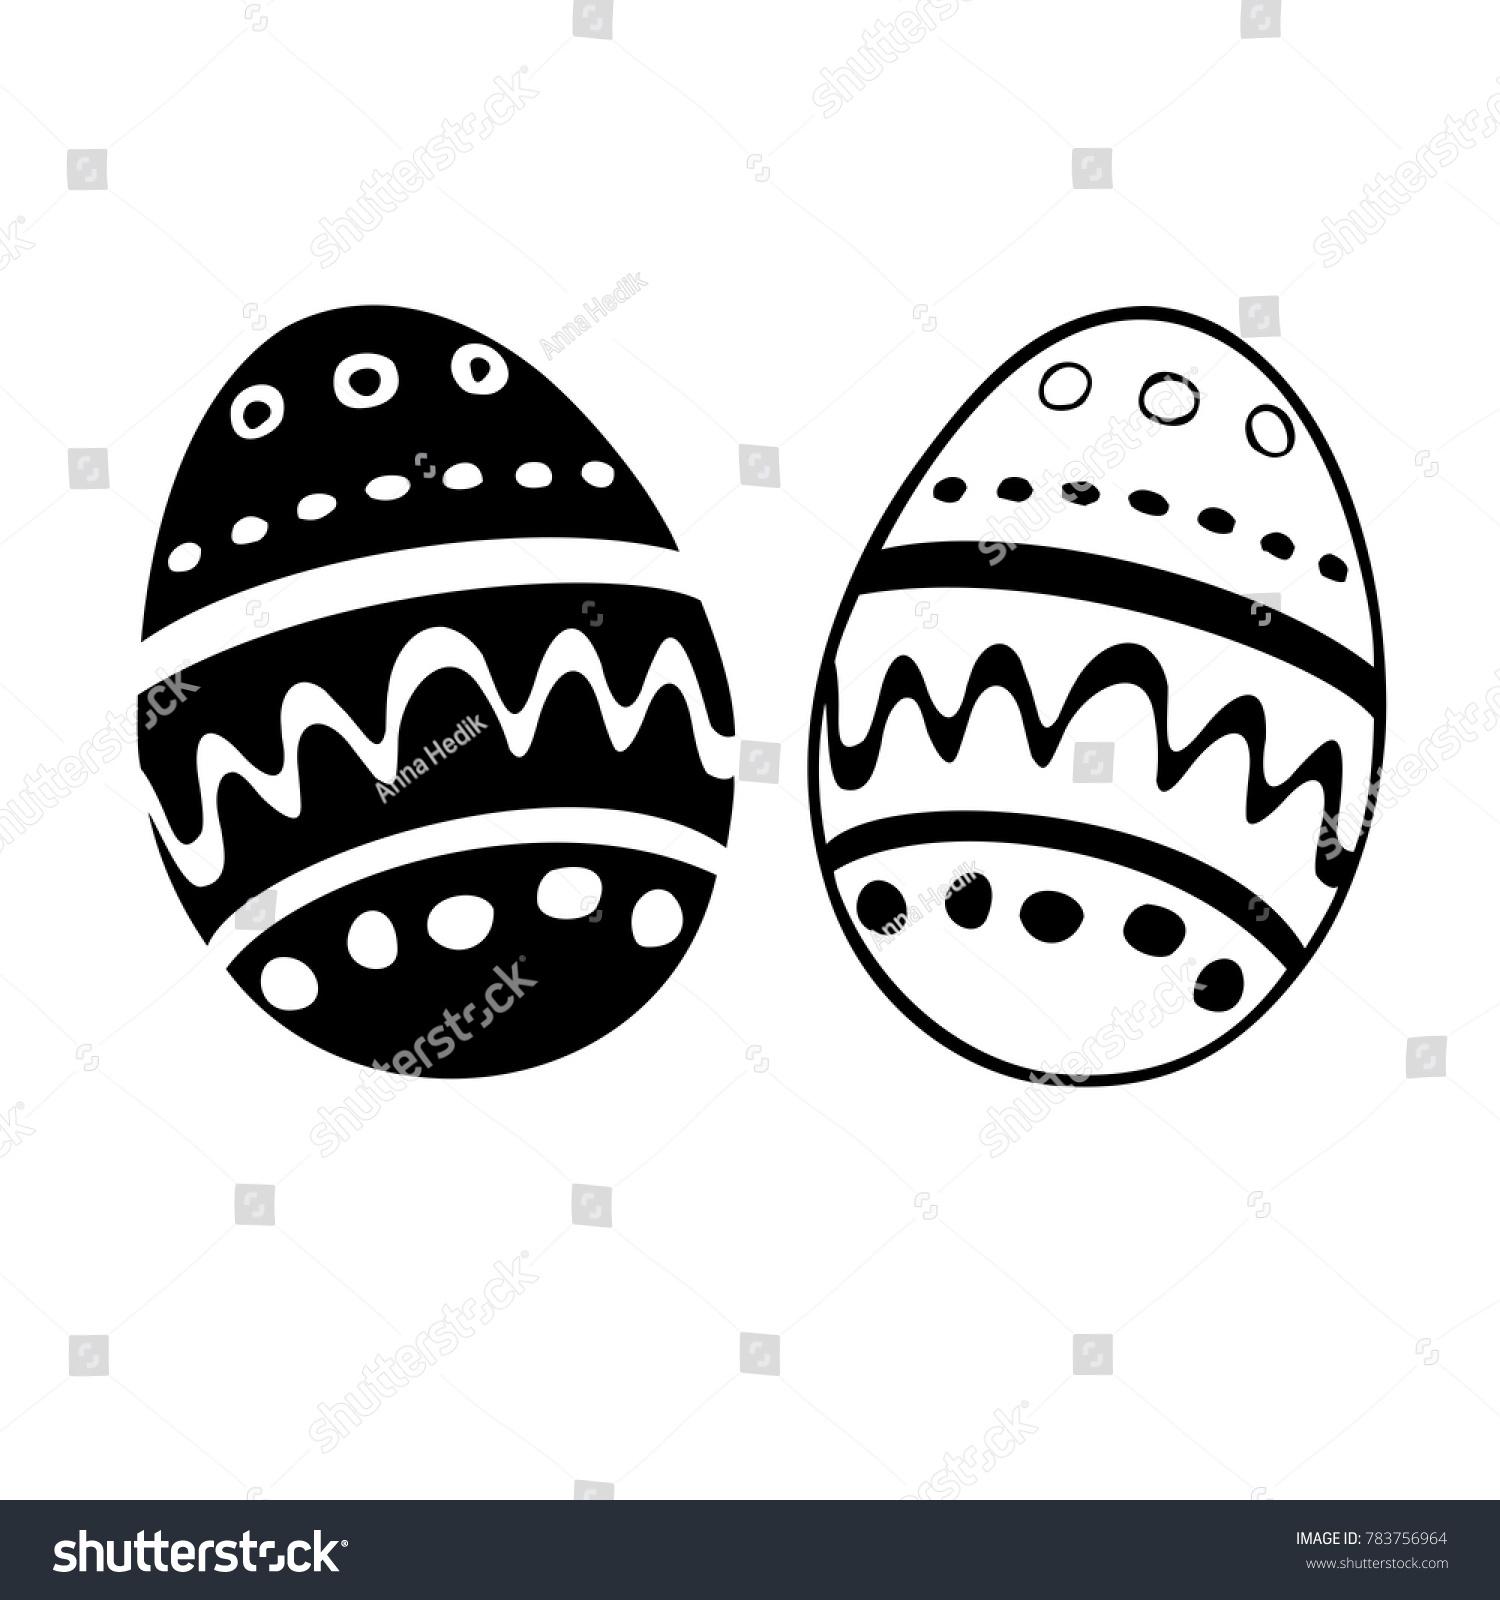 Egg icon easter eggs symbol black stock vector 783756964 egg icon easter eggs symbol black and white flat vector holiday buycottarizona